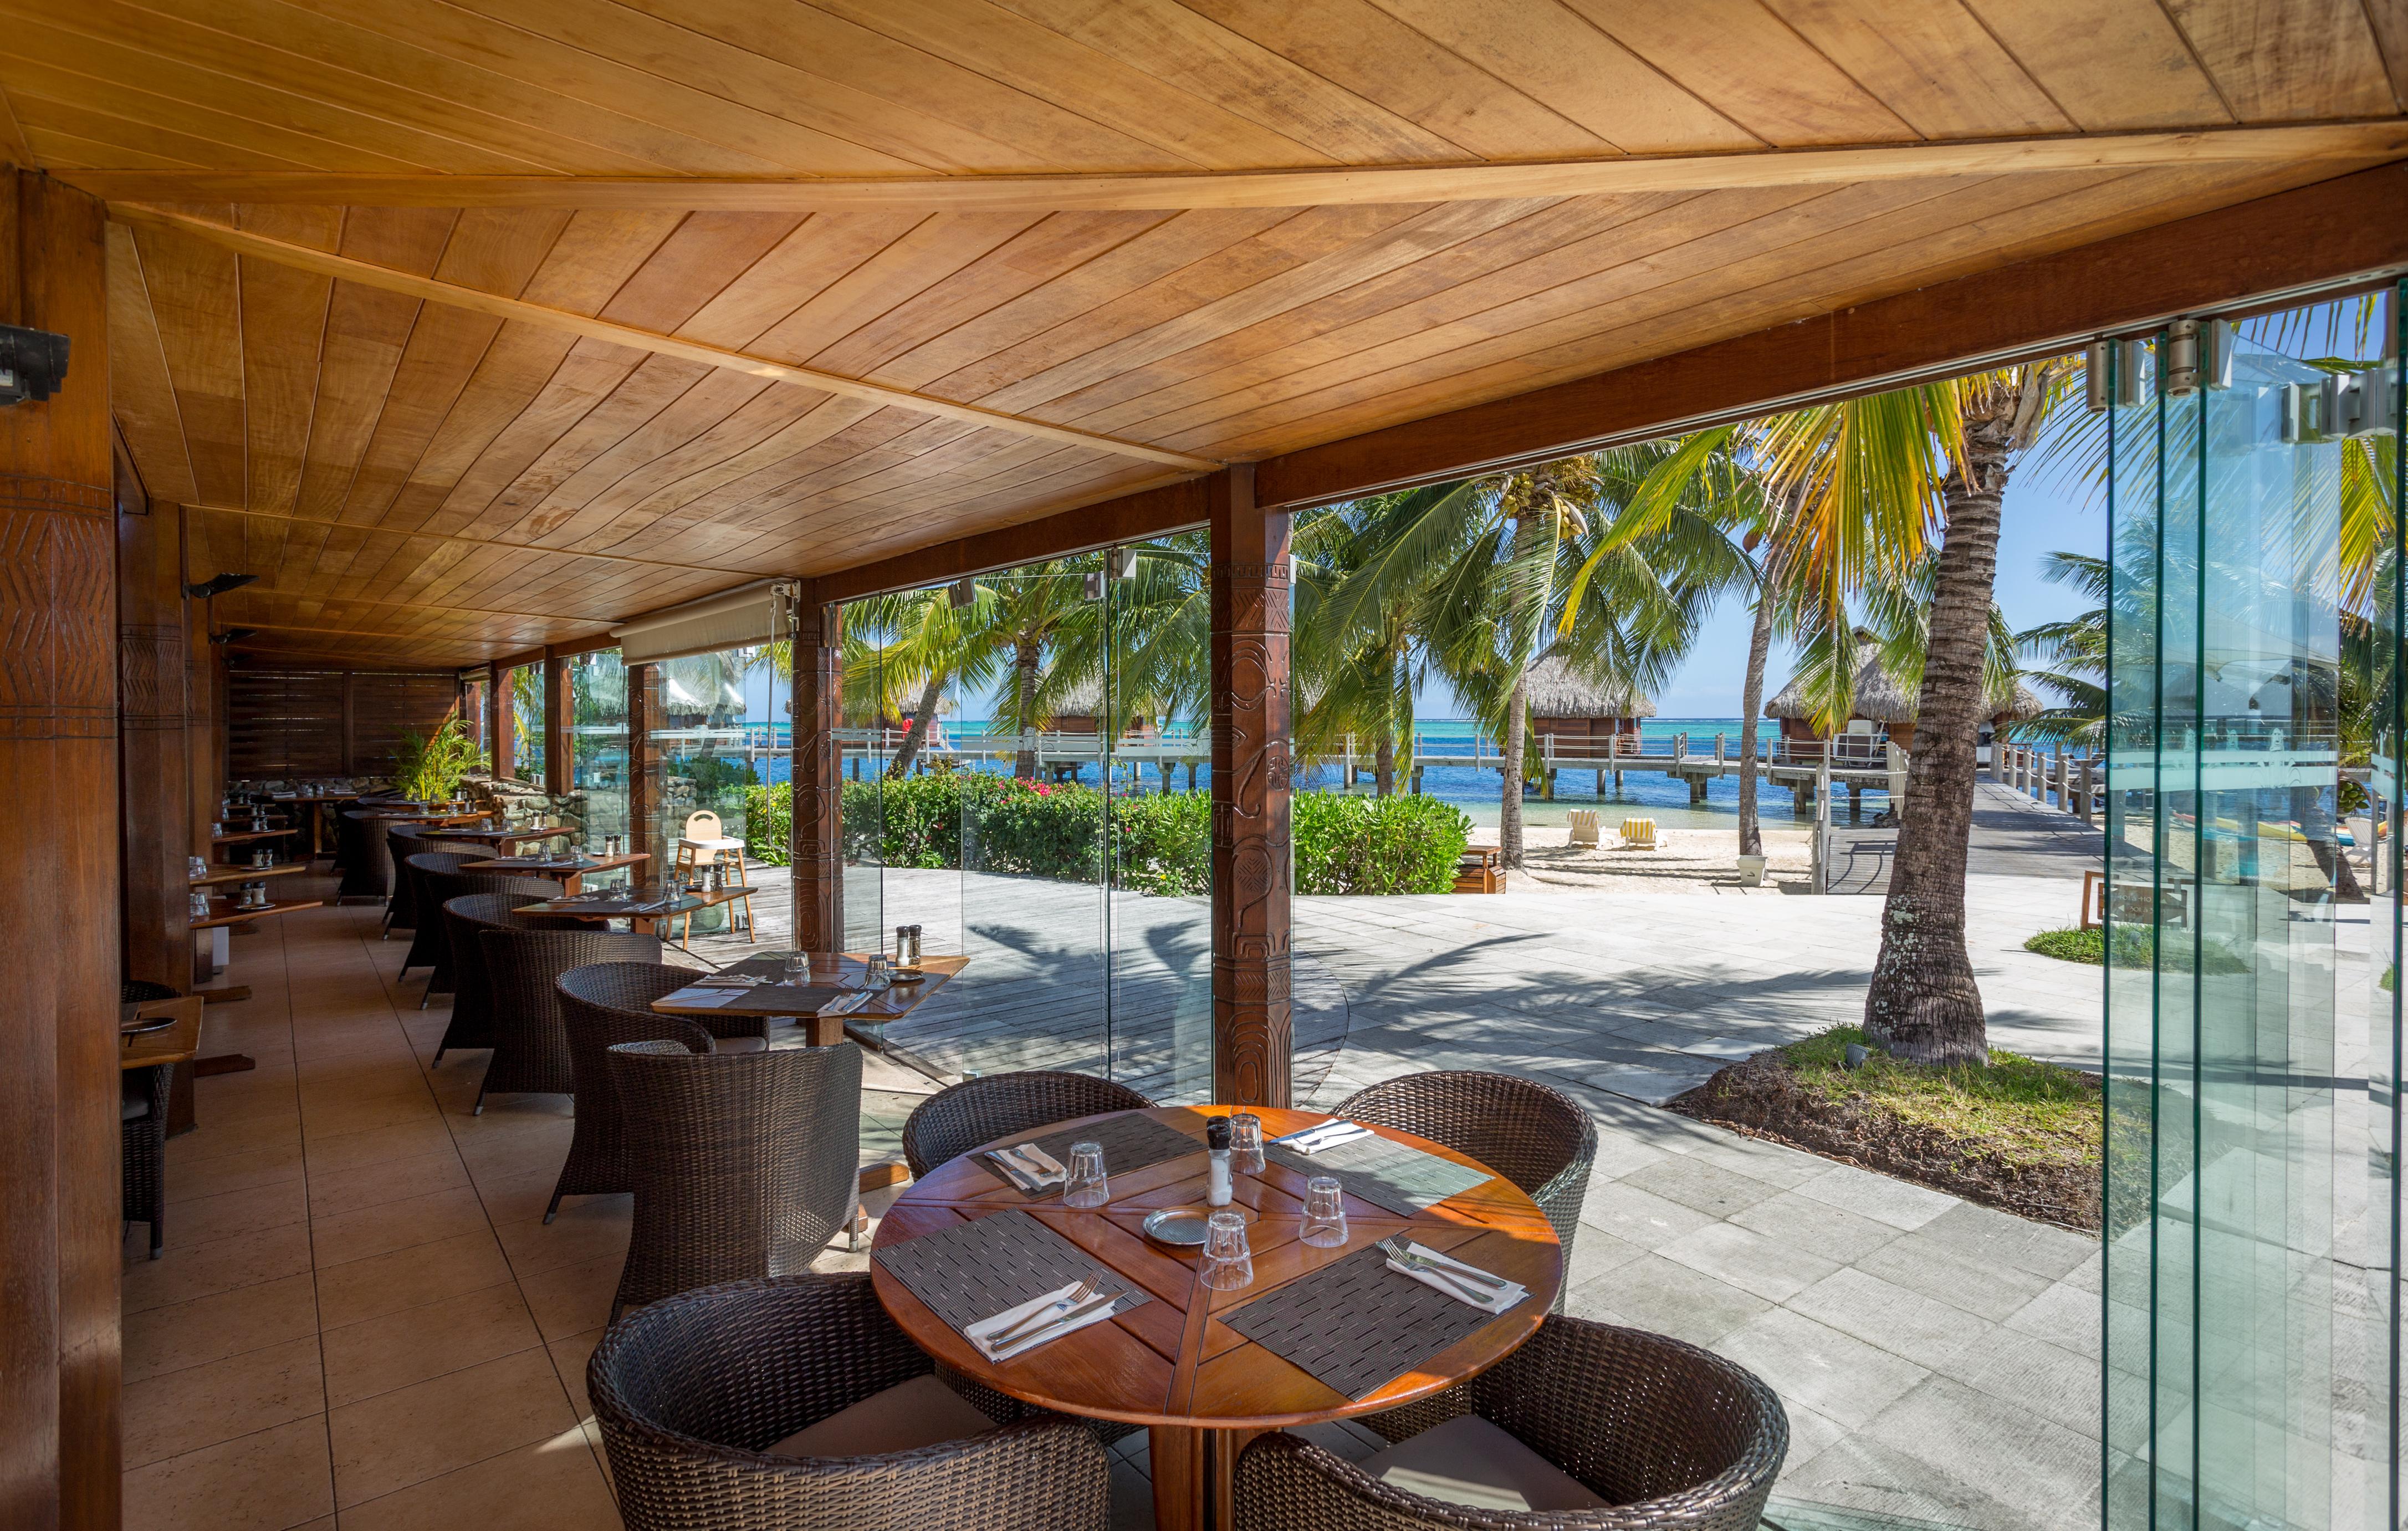 https://tahititourisme.cn/wp-content/uploads/2018/03/RESTAURATION-Restaurant-Mahanai-1-Charles_Veronese.jpg